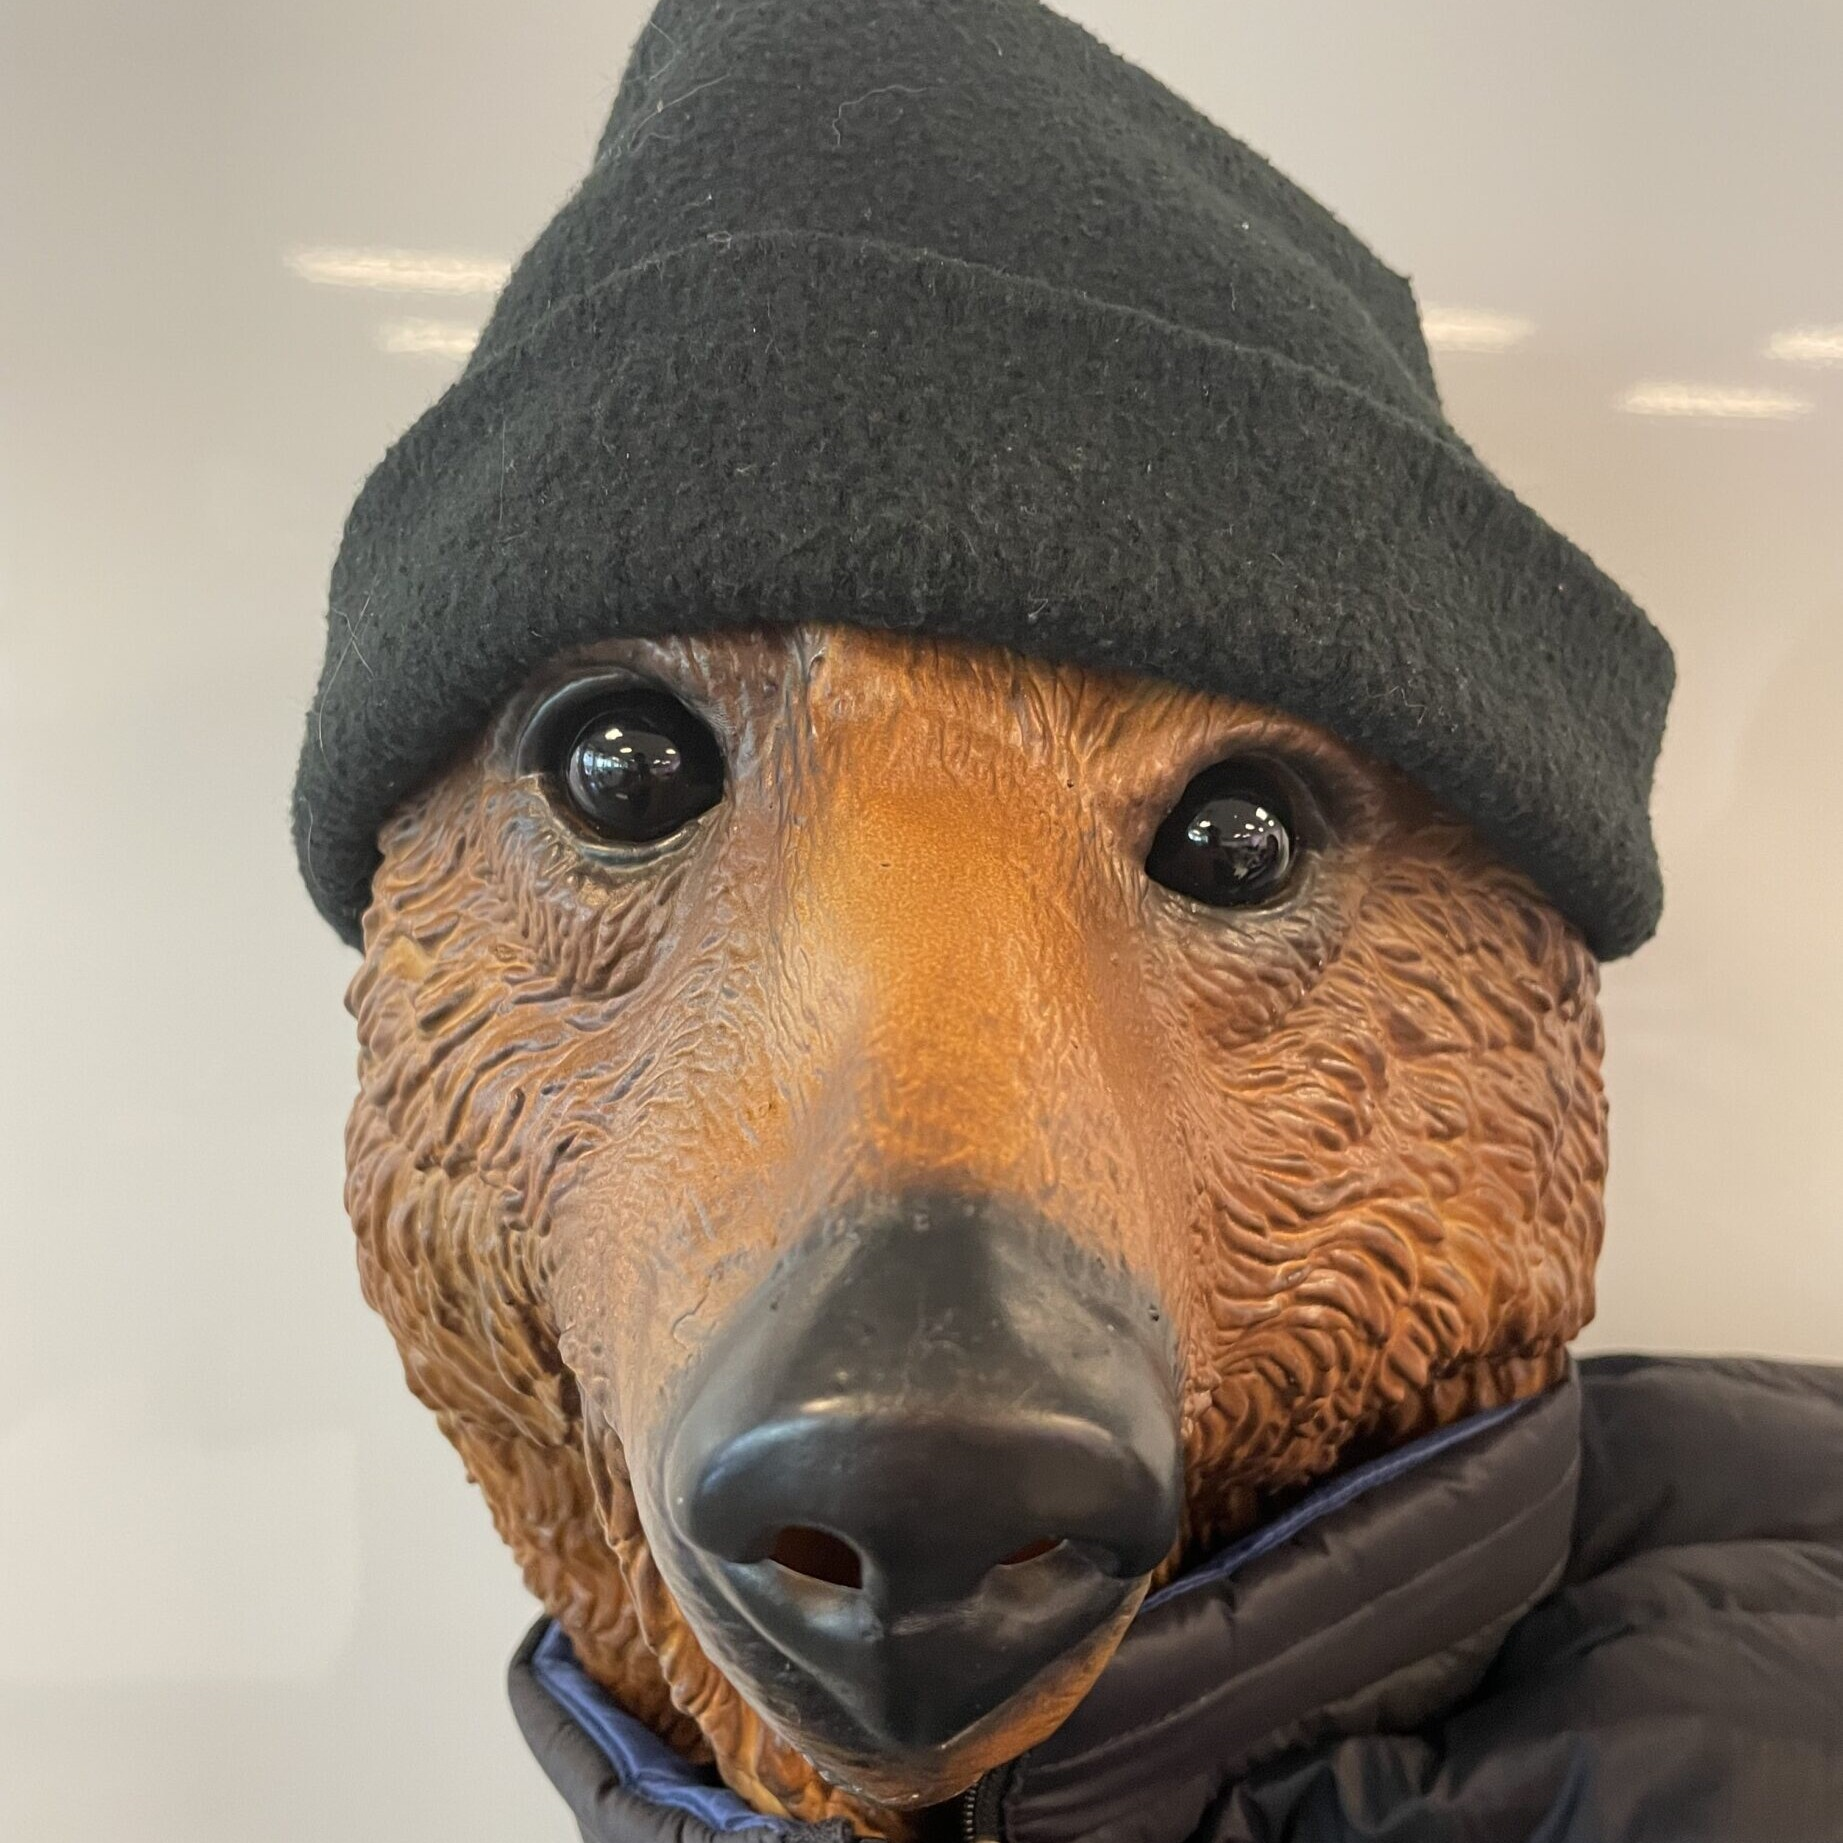 A bear wearing a beany